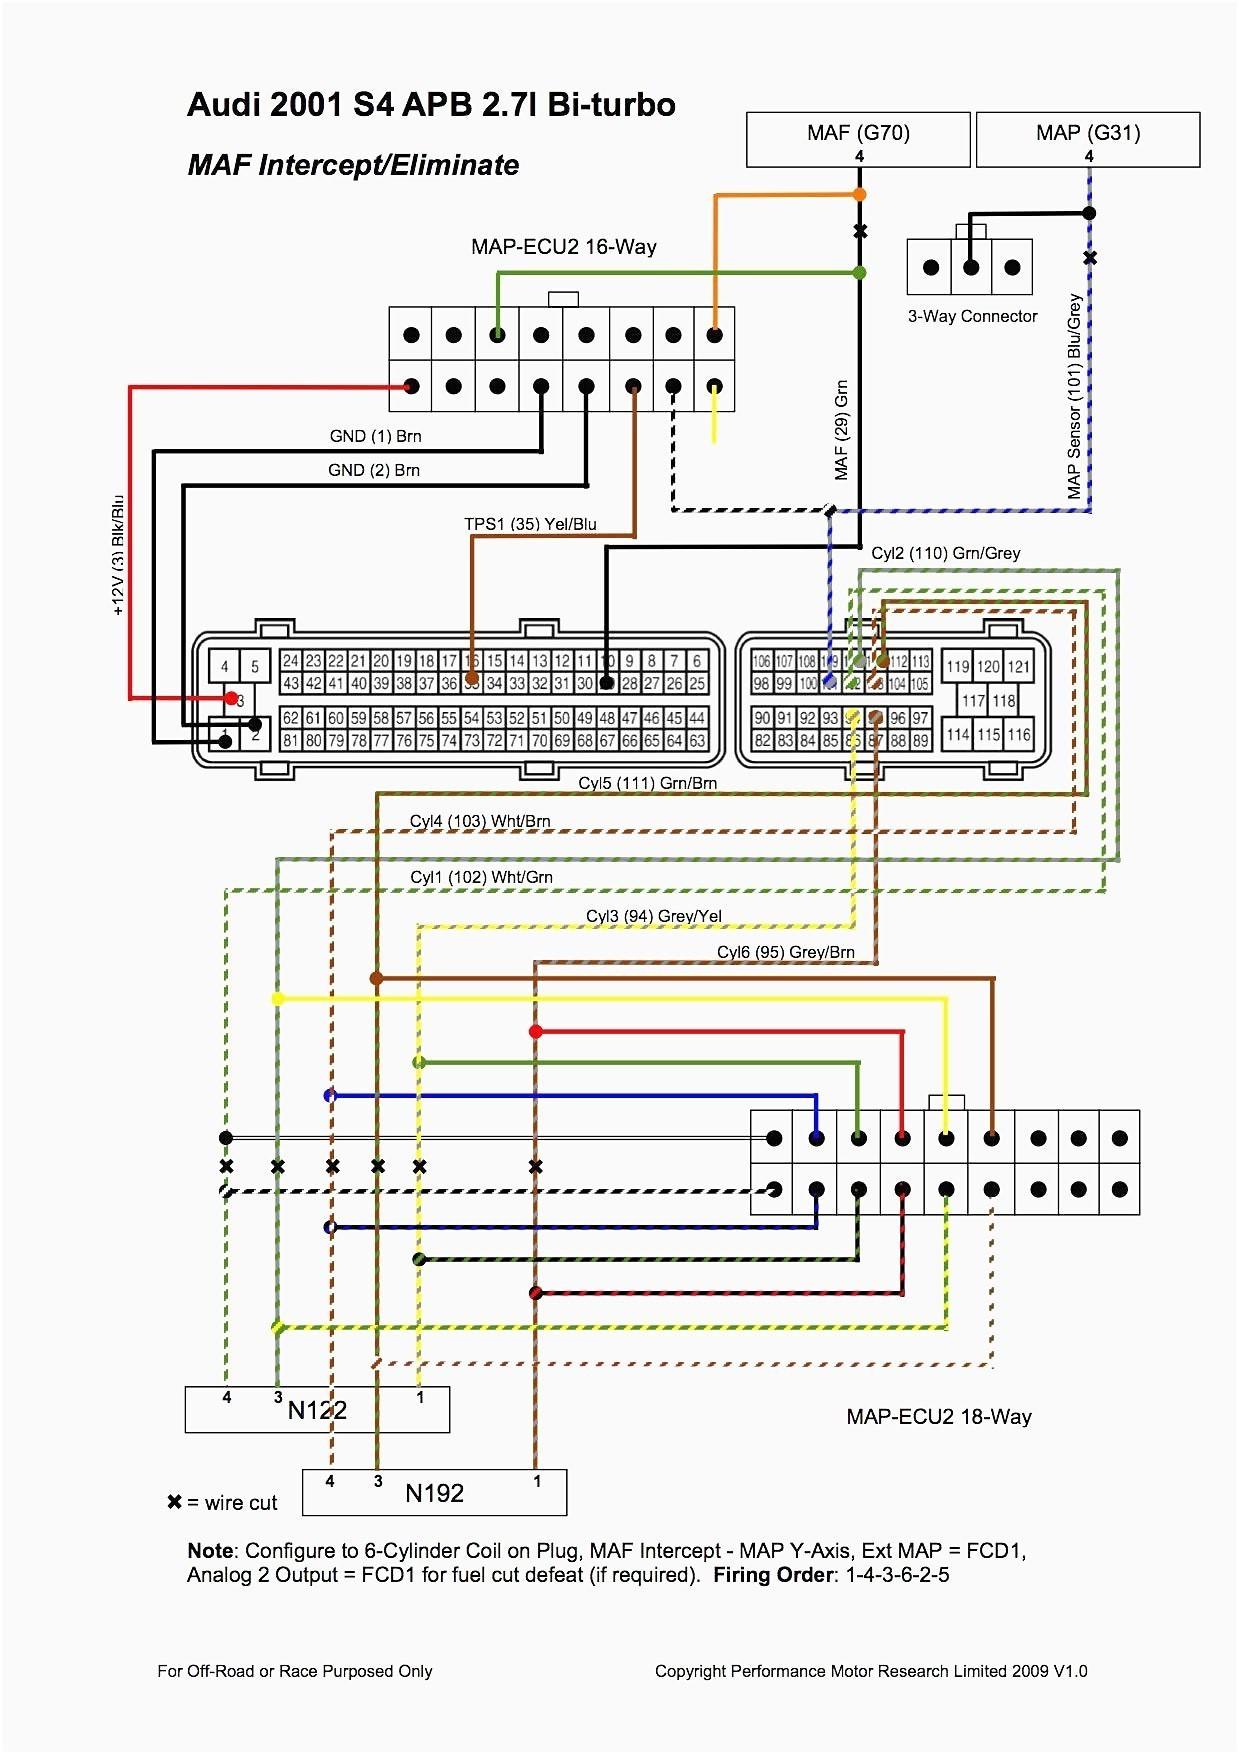 DG_7450] 93 Civic Radio Wiring Diagram Wiring DiagramLline Oupli Weasi Hila Reda Ixtu Onica Dext Cajos Kicep Zidur Opein  Mohammedshrine Librar Wiring 101